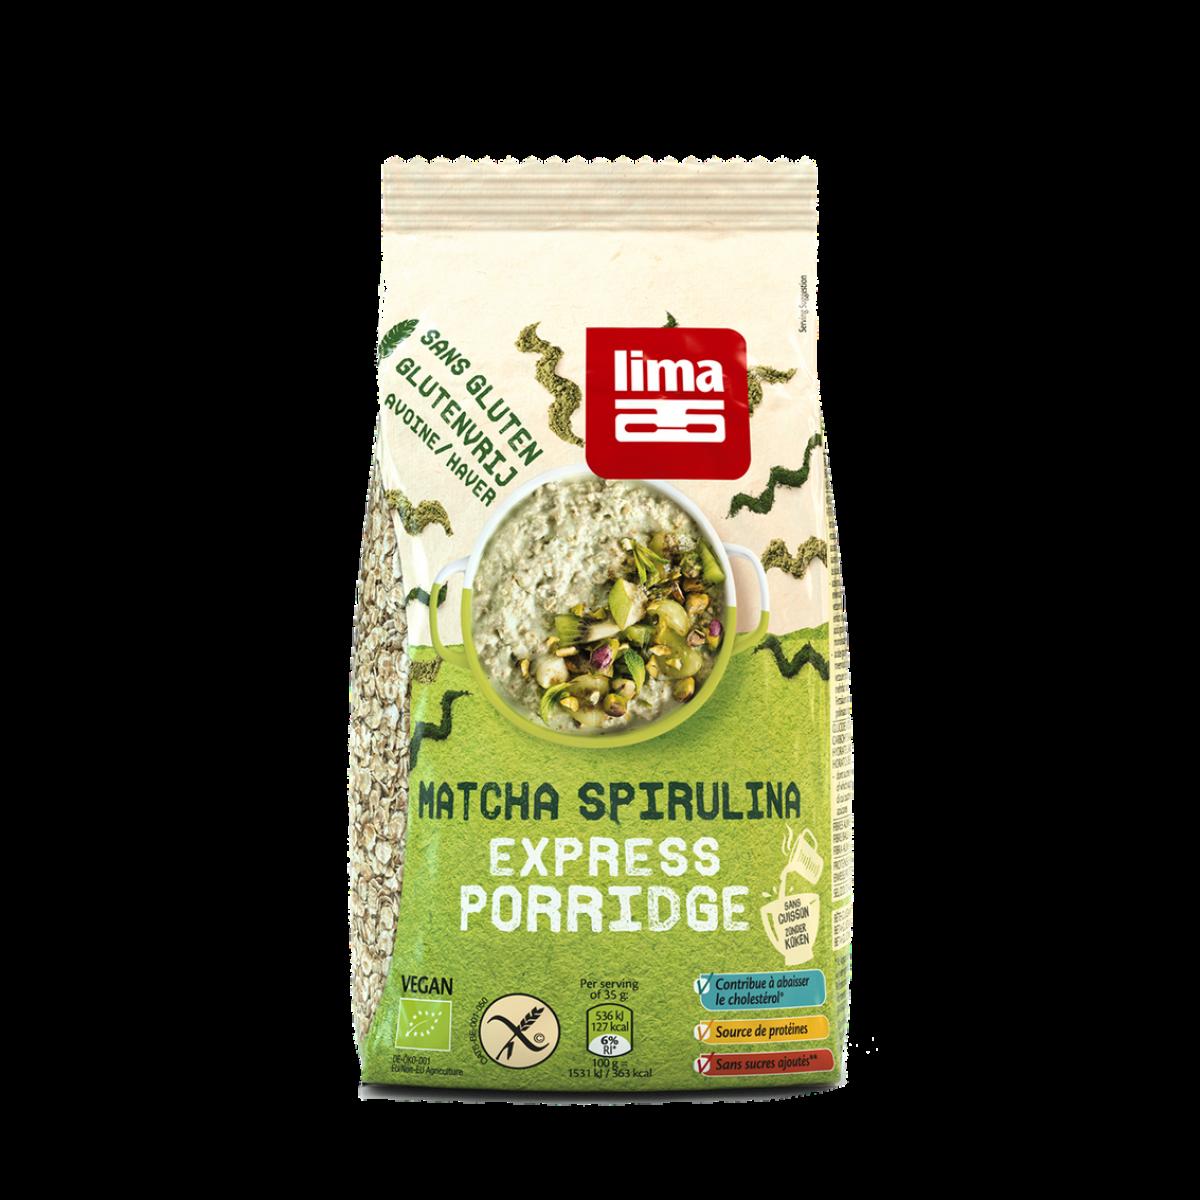 Matcha Spirulina Express Porridge